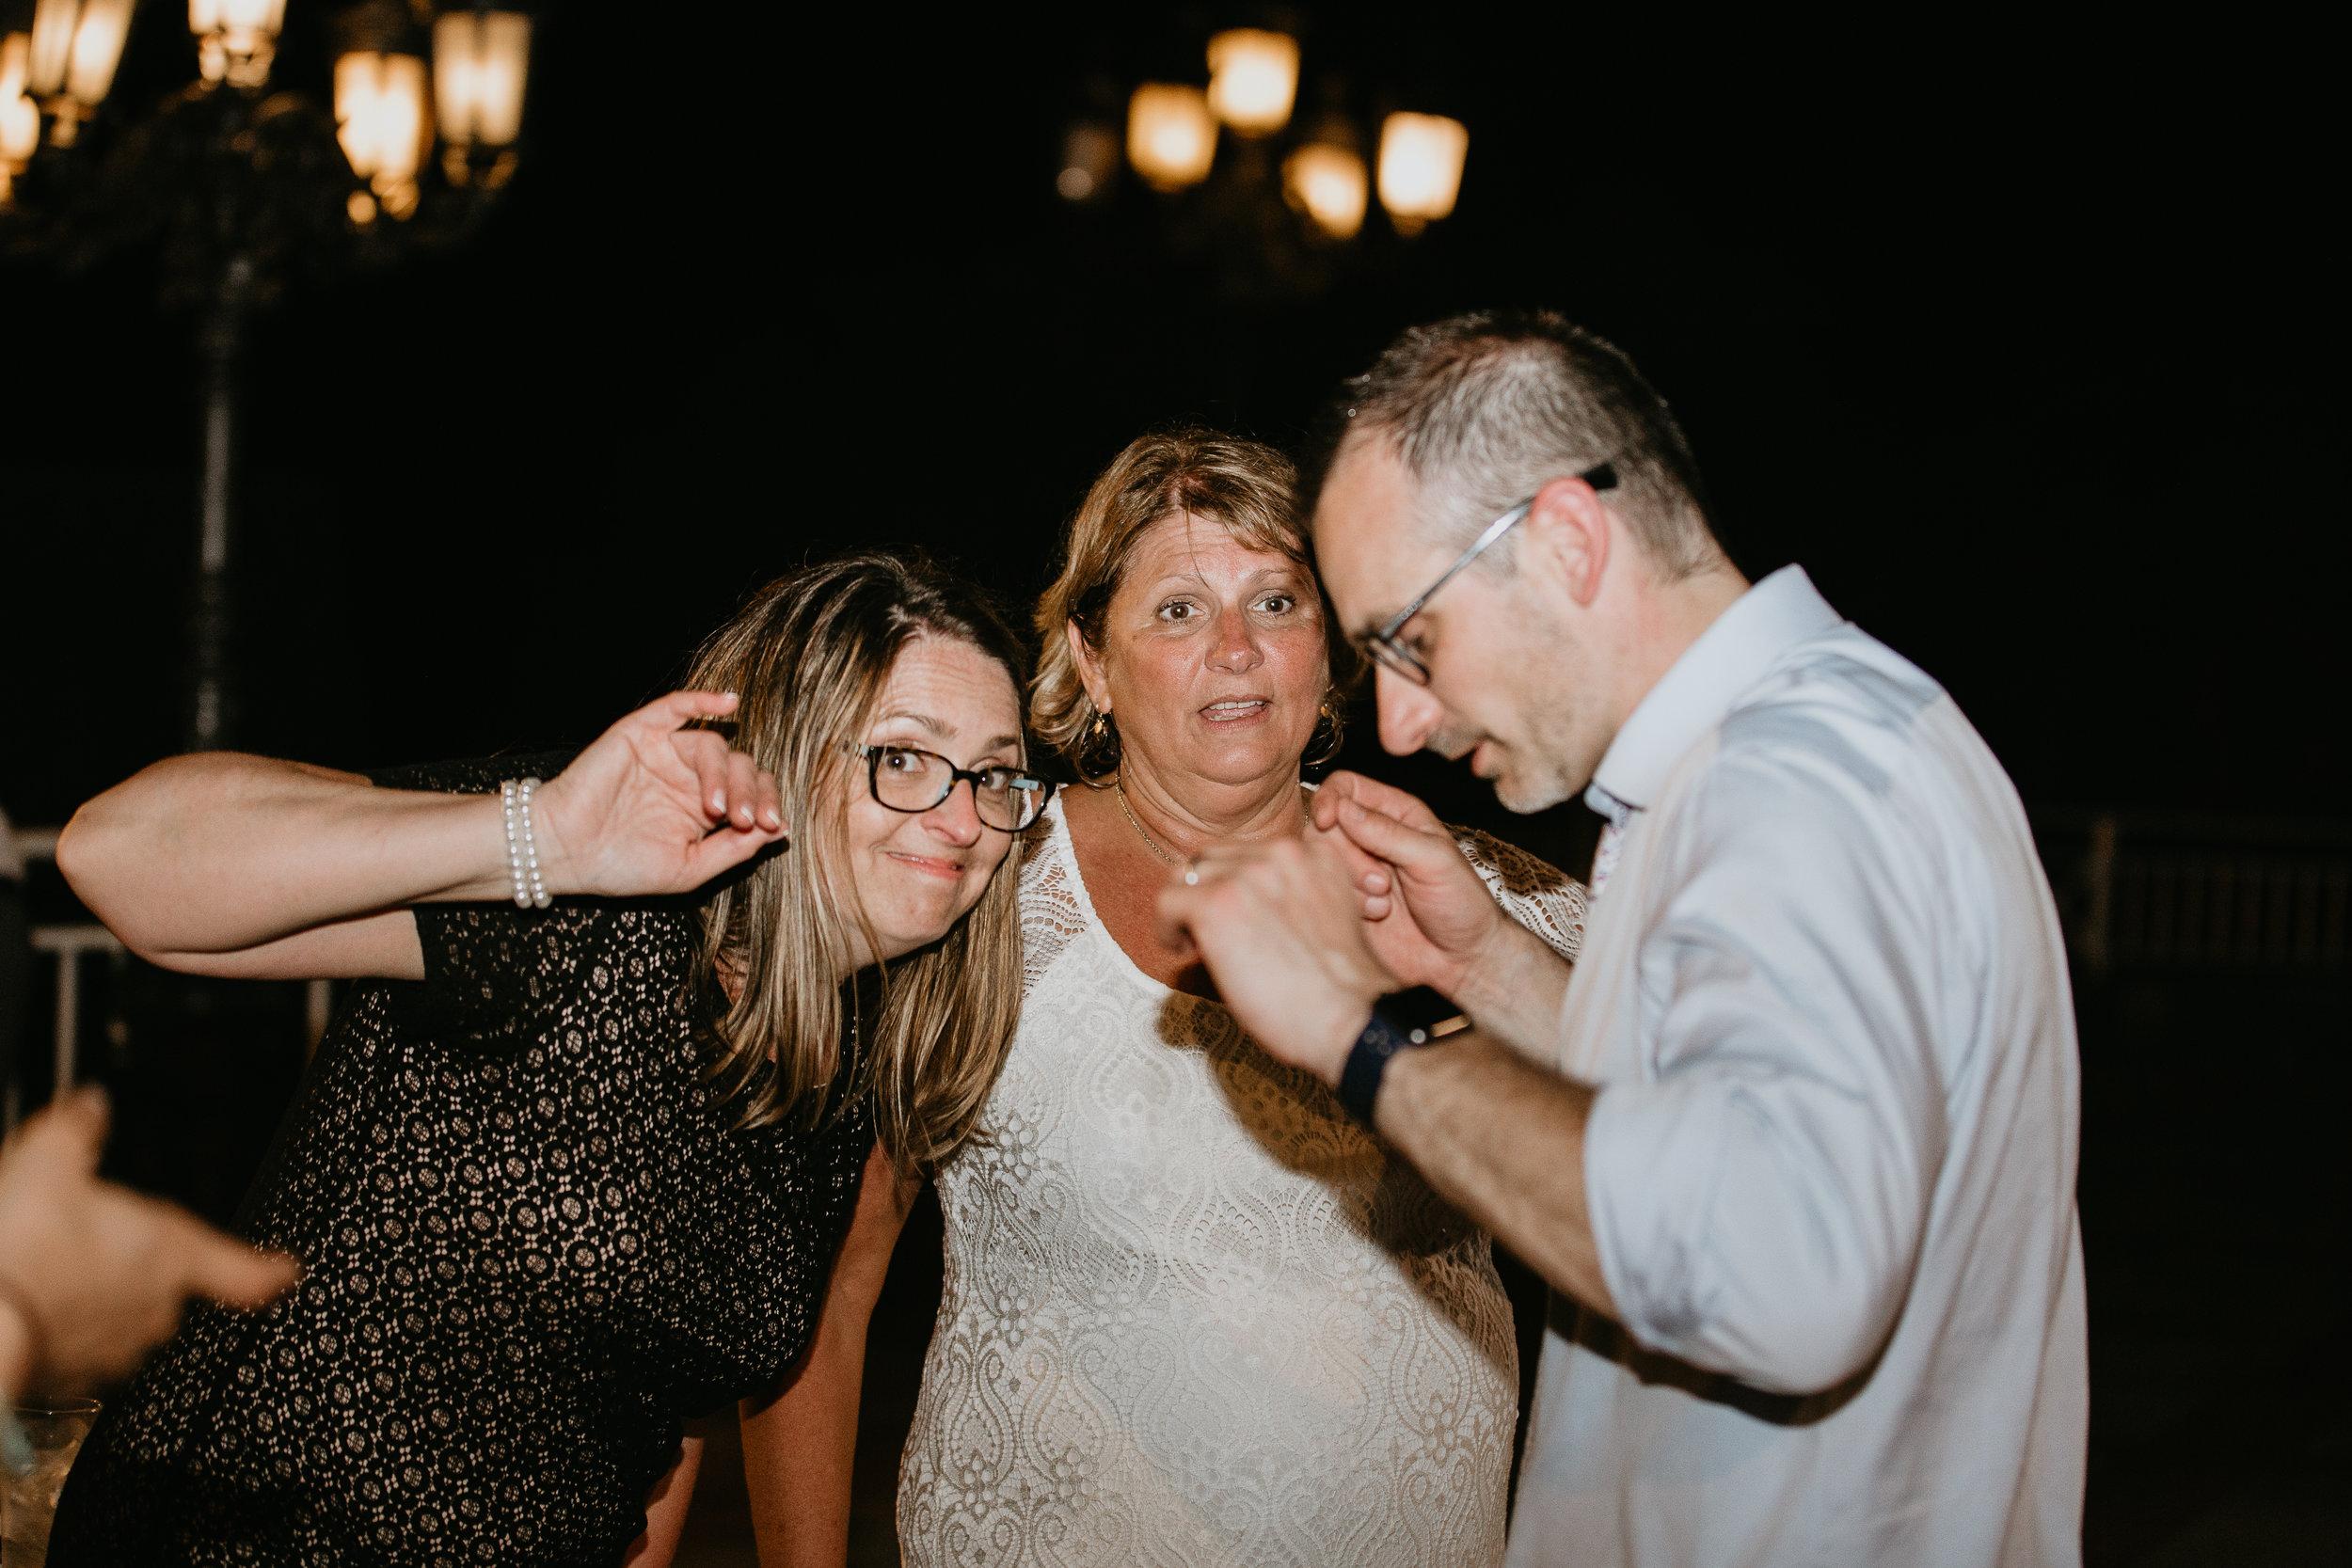 nicole-daacke-photography-destination-wedding-in-st-lucia-sandals-la-toc-intimate-island-wedding-carribean-elopement-photographer-chill-island-wedding-175.jpg